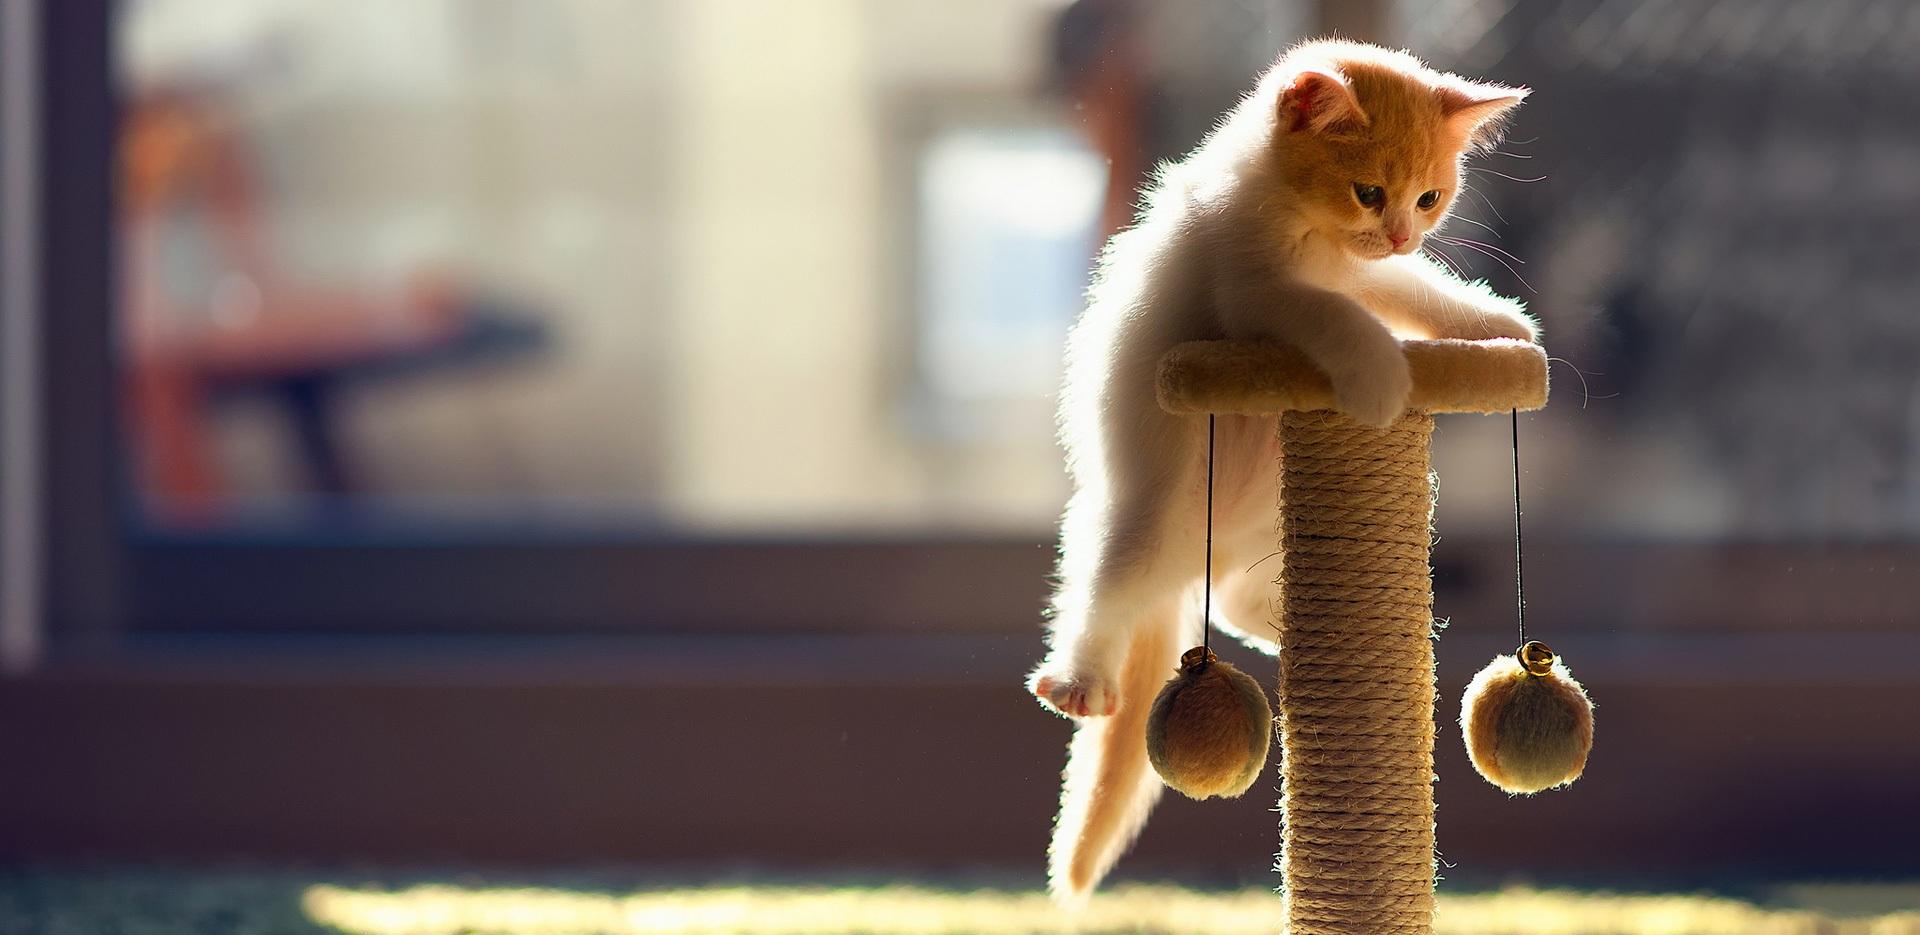 Kat speelt